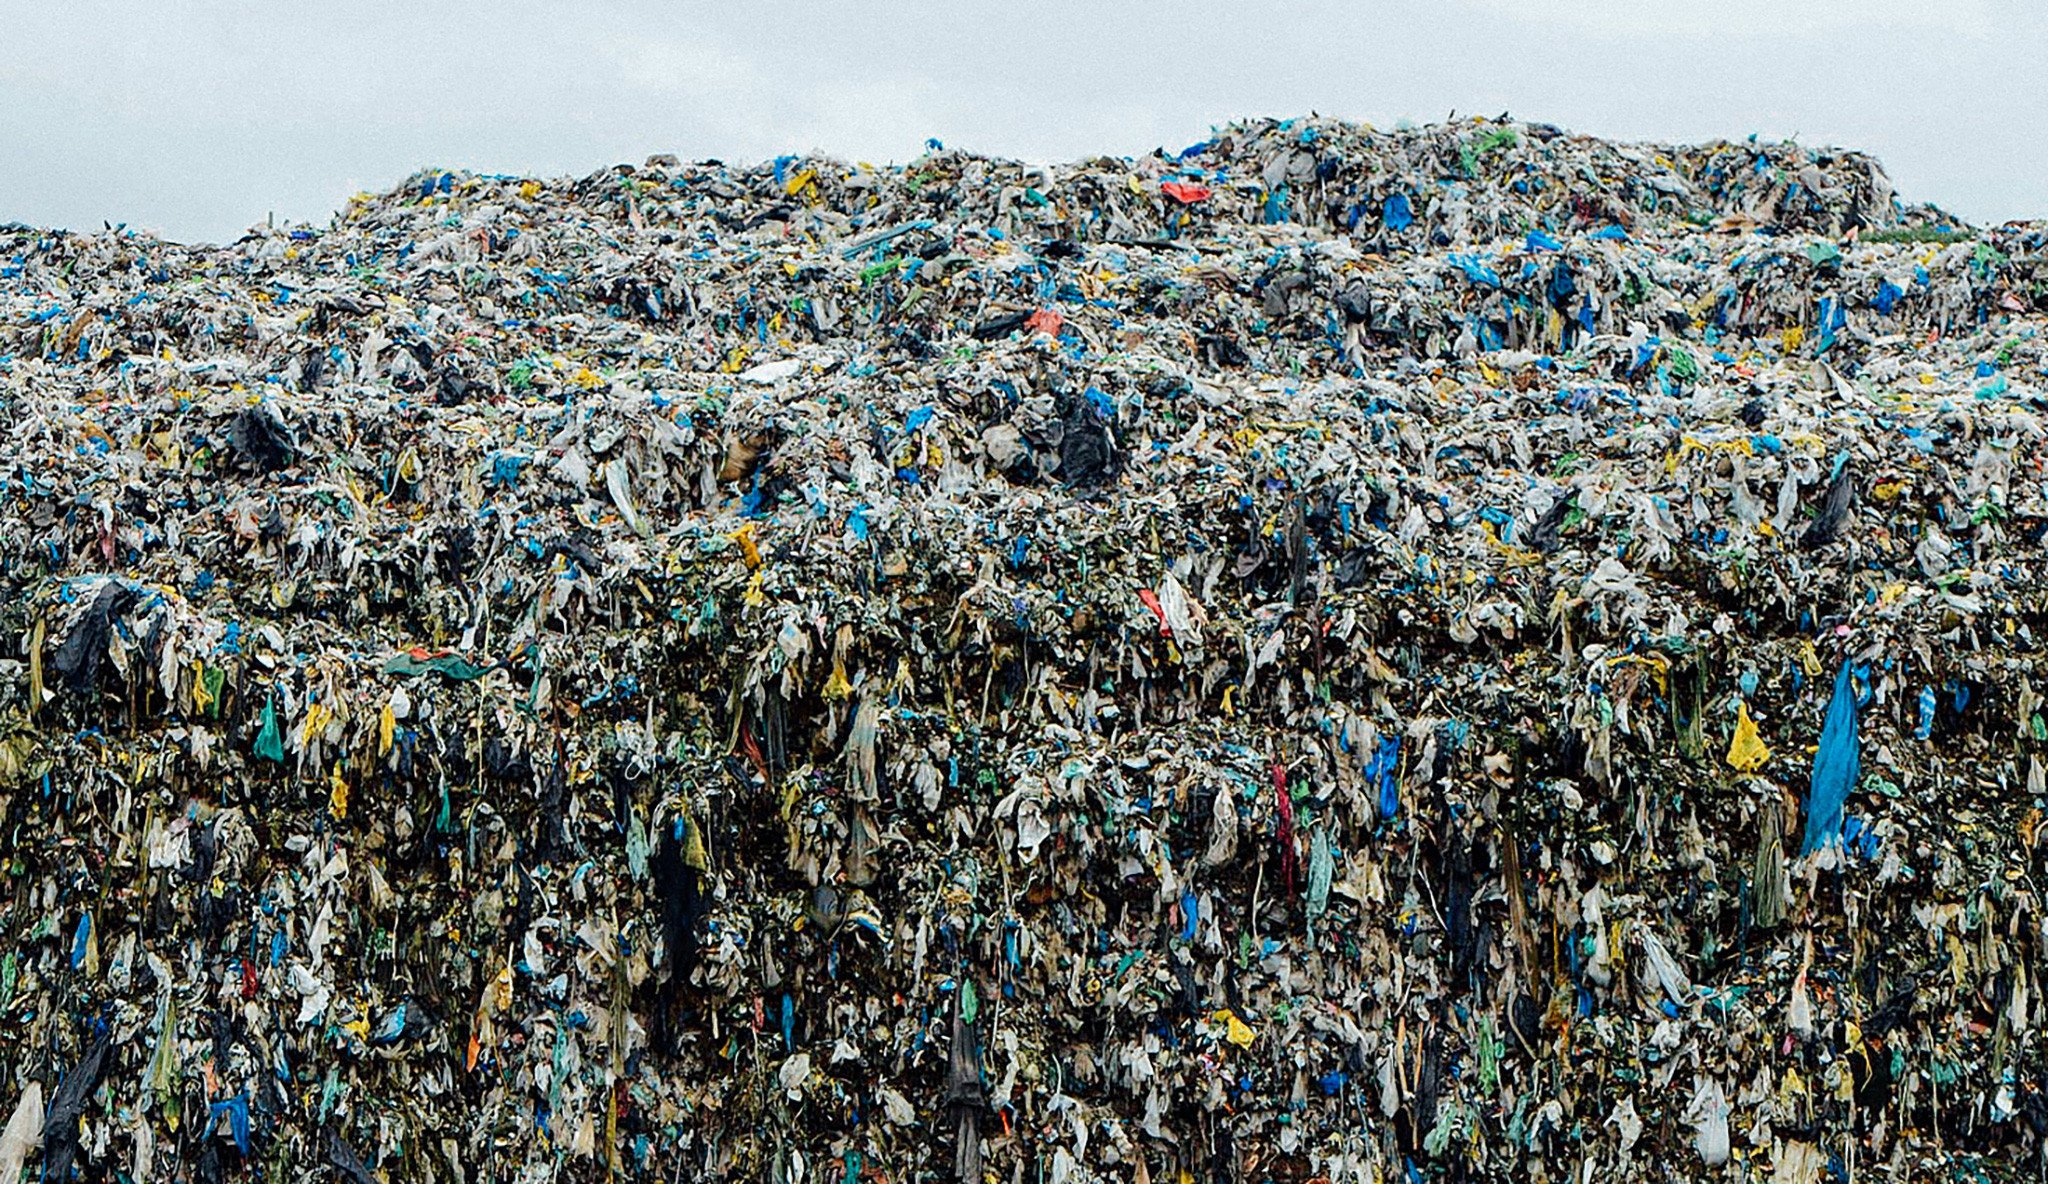 Used Clothing Dump Site in Manila, Philippines